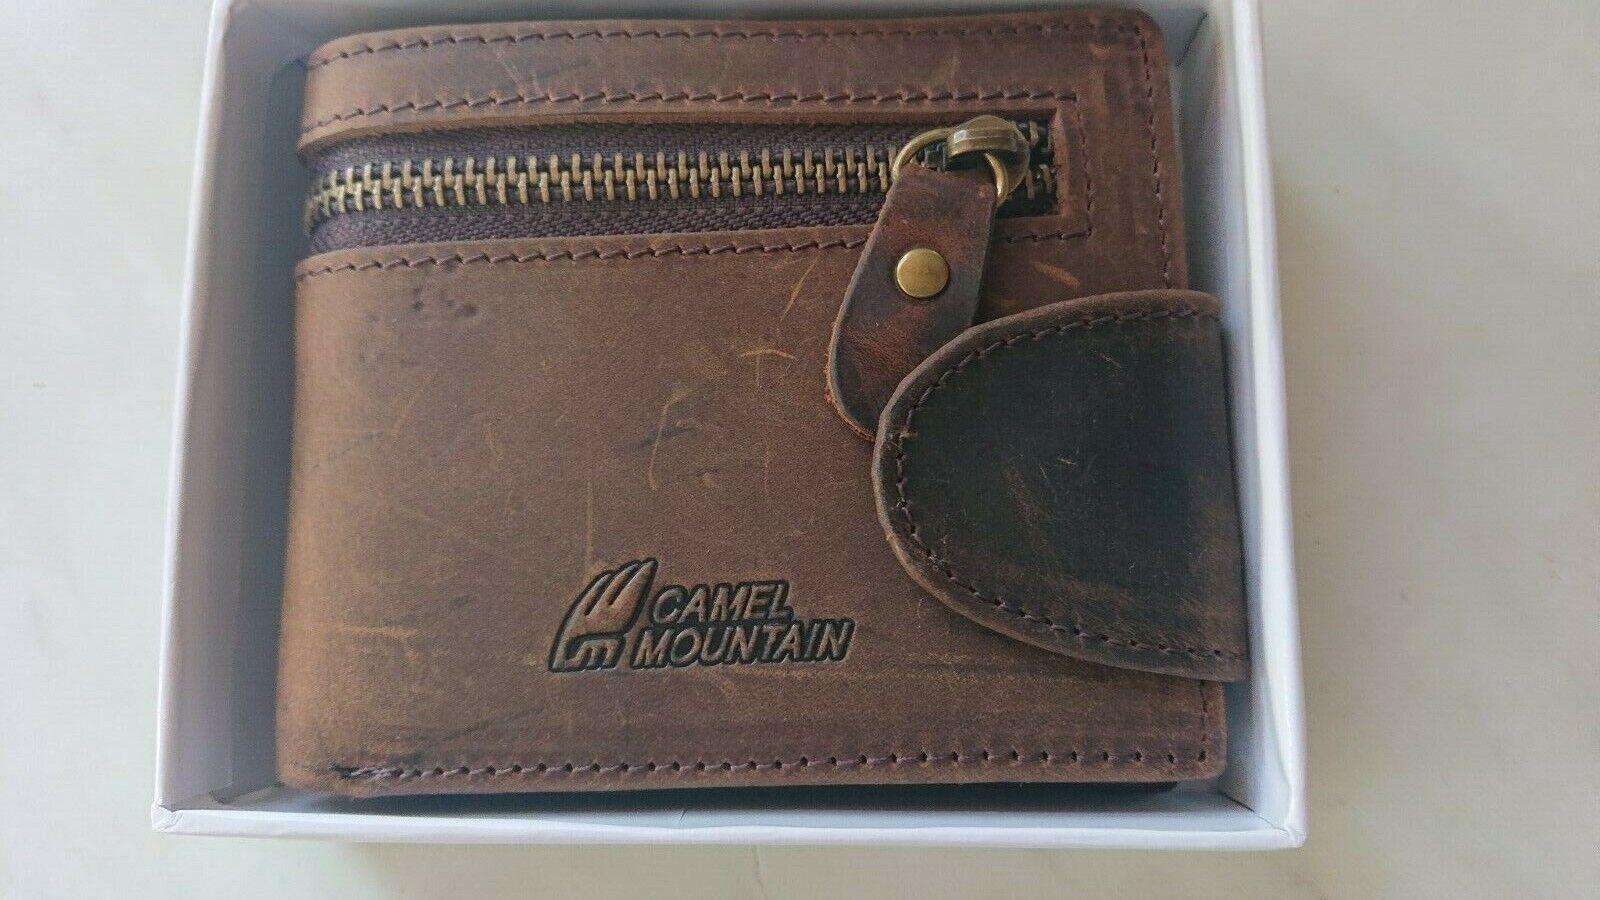 Camel Mountain Wallet in box